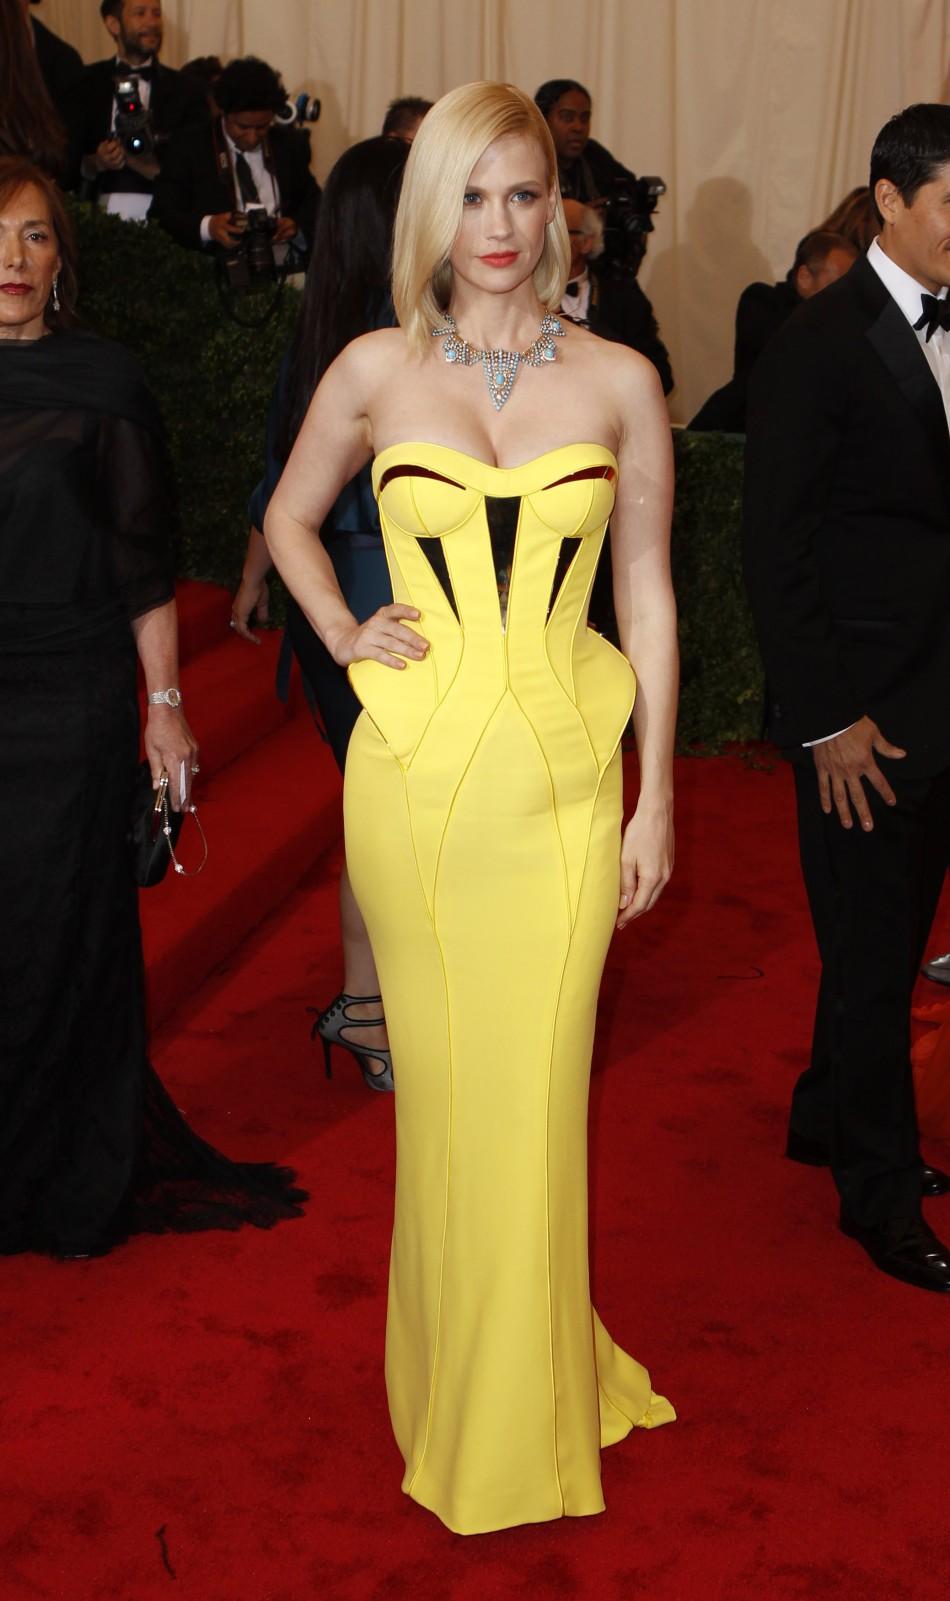 Actress January Jones arrives at the Metropolitan Museum of Art Costume Institute Benefit in New York